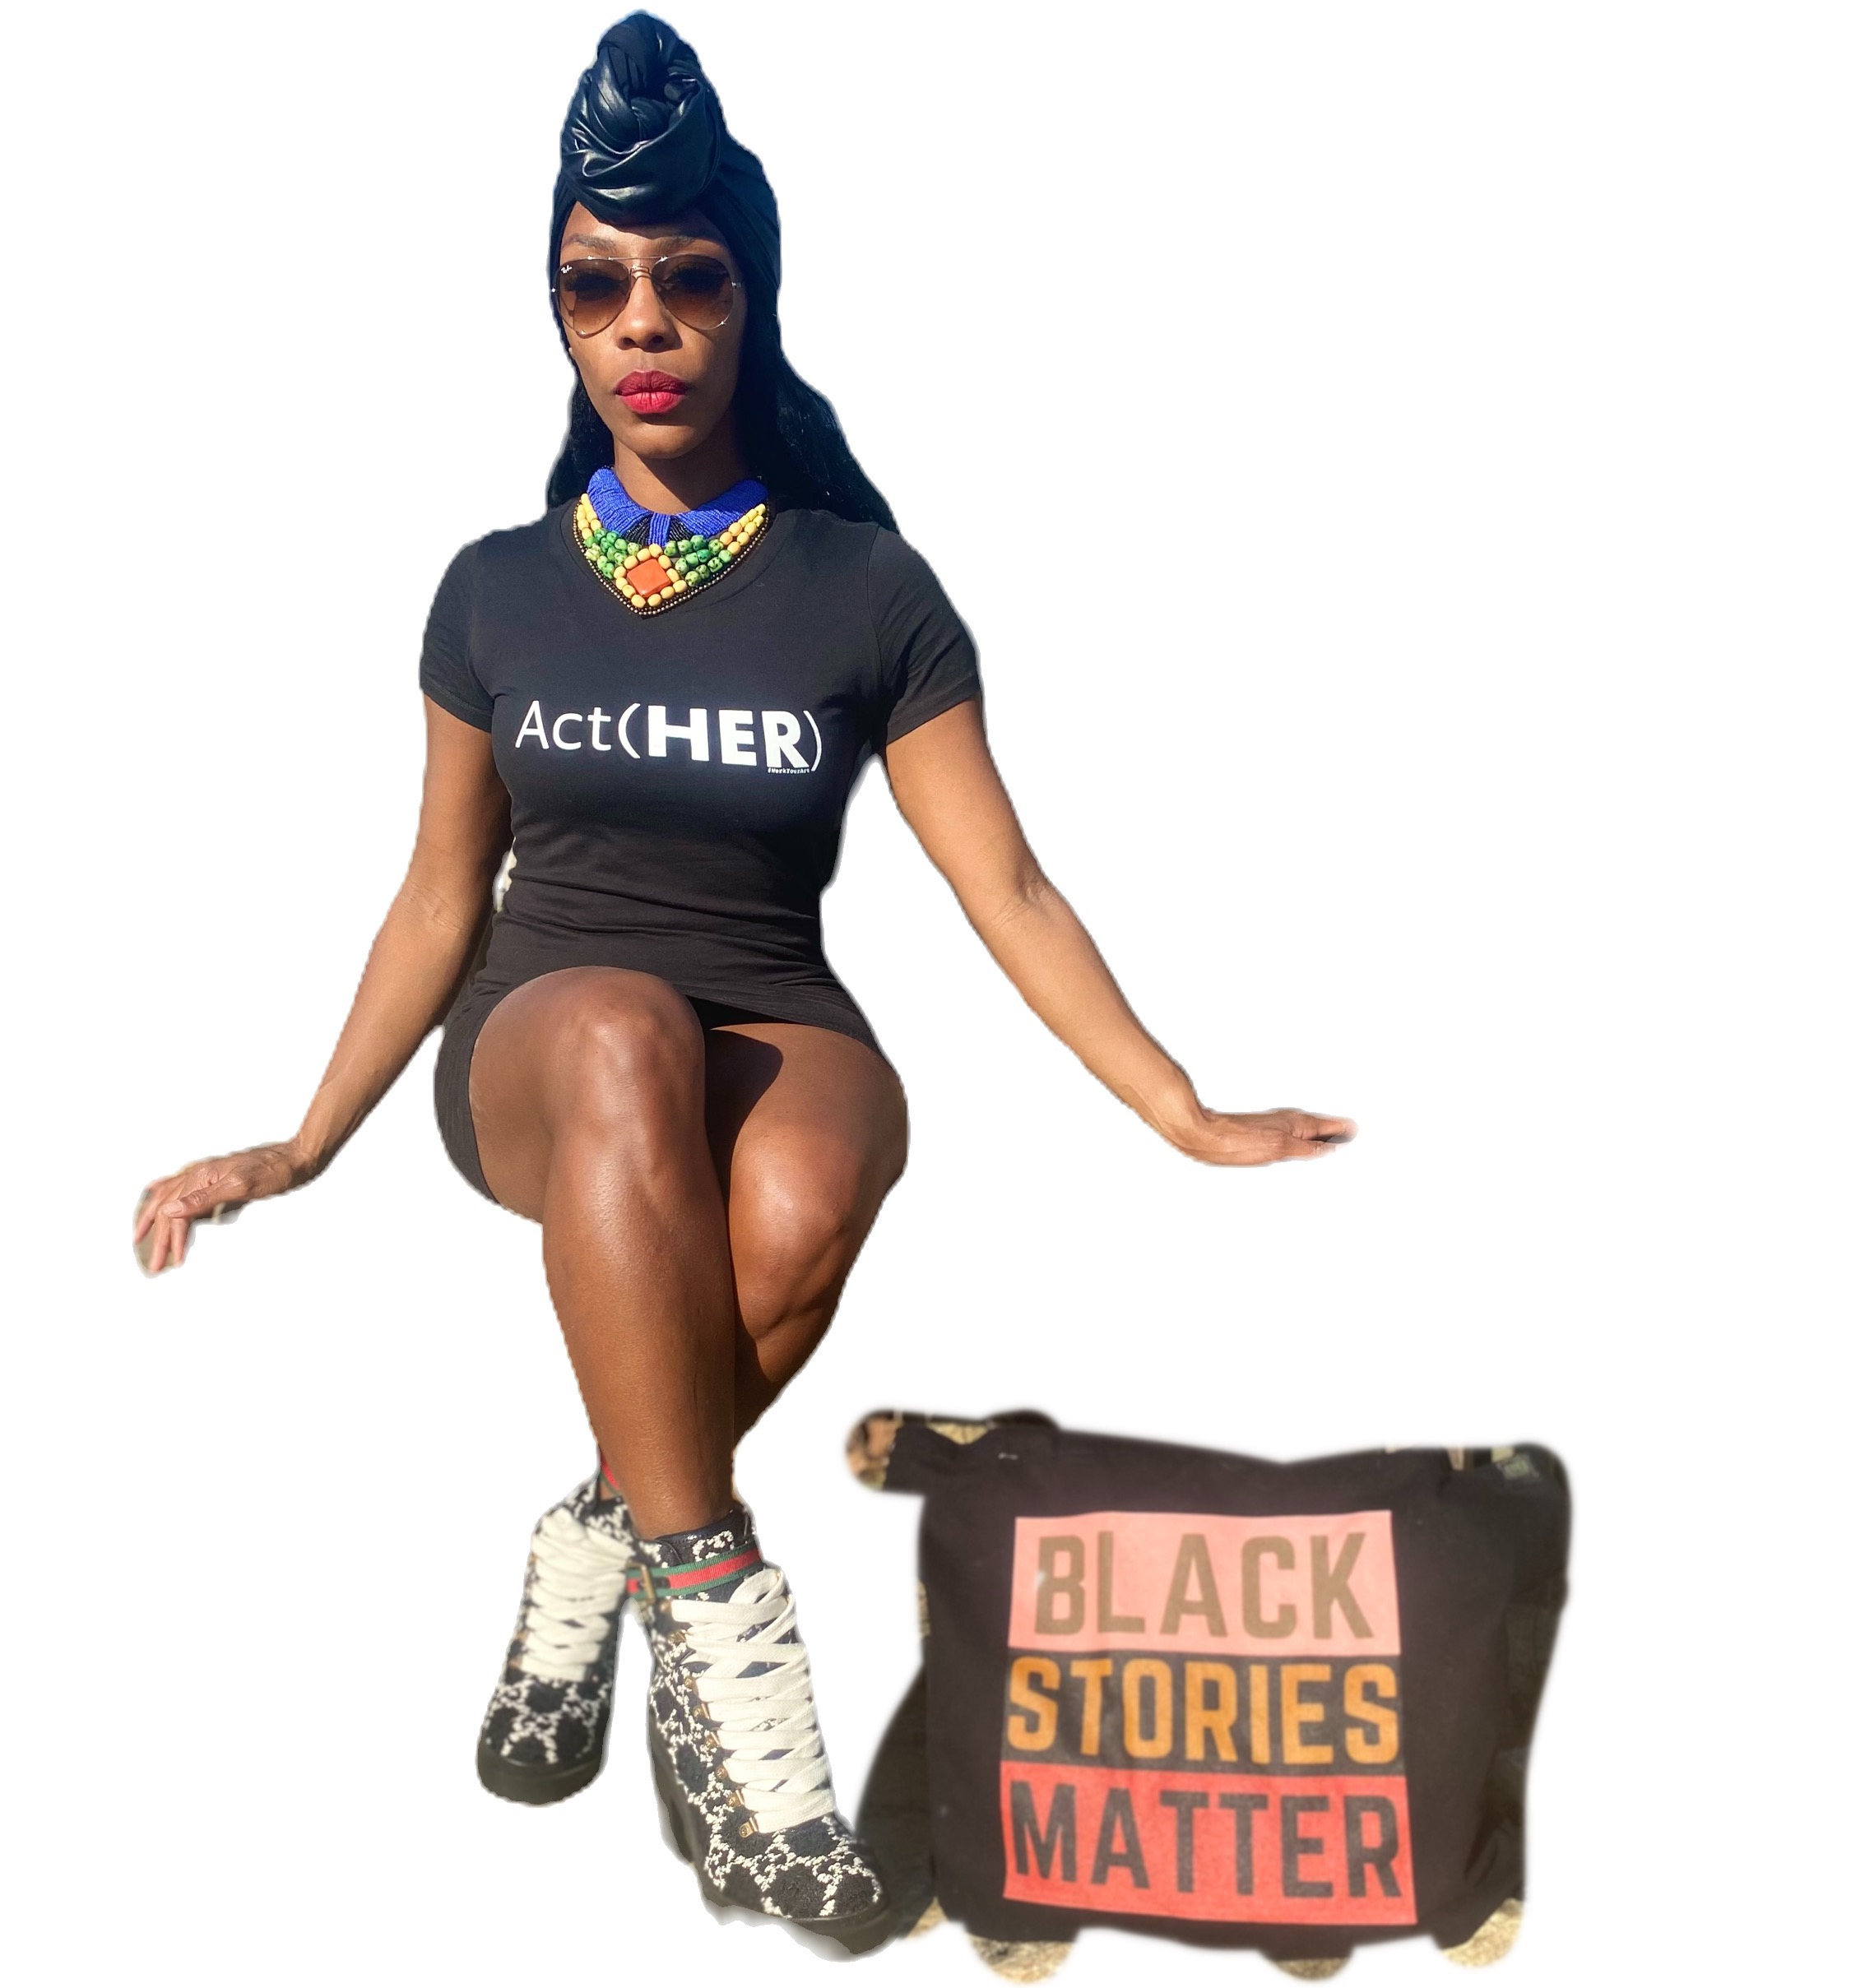 ActHER & Black Stories Matter Design